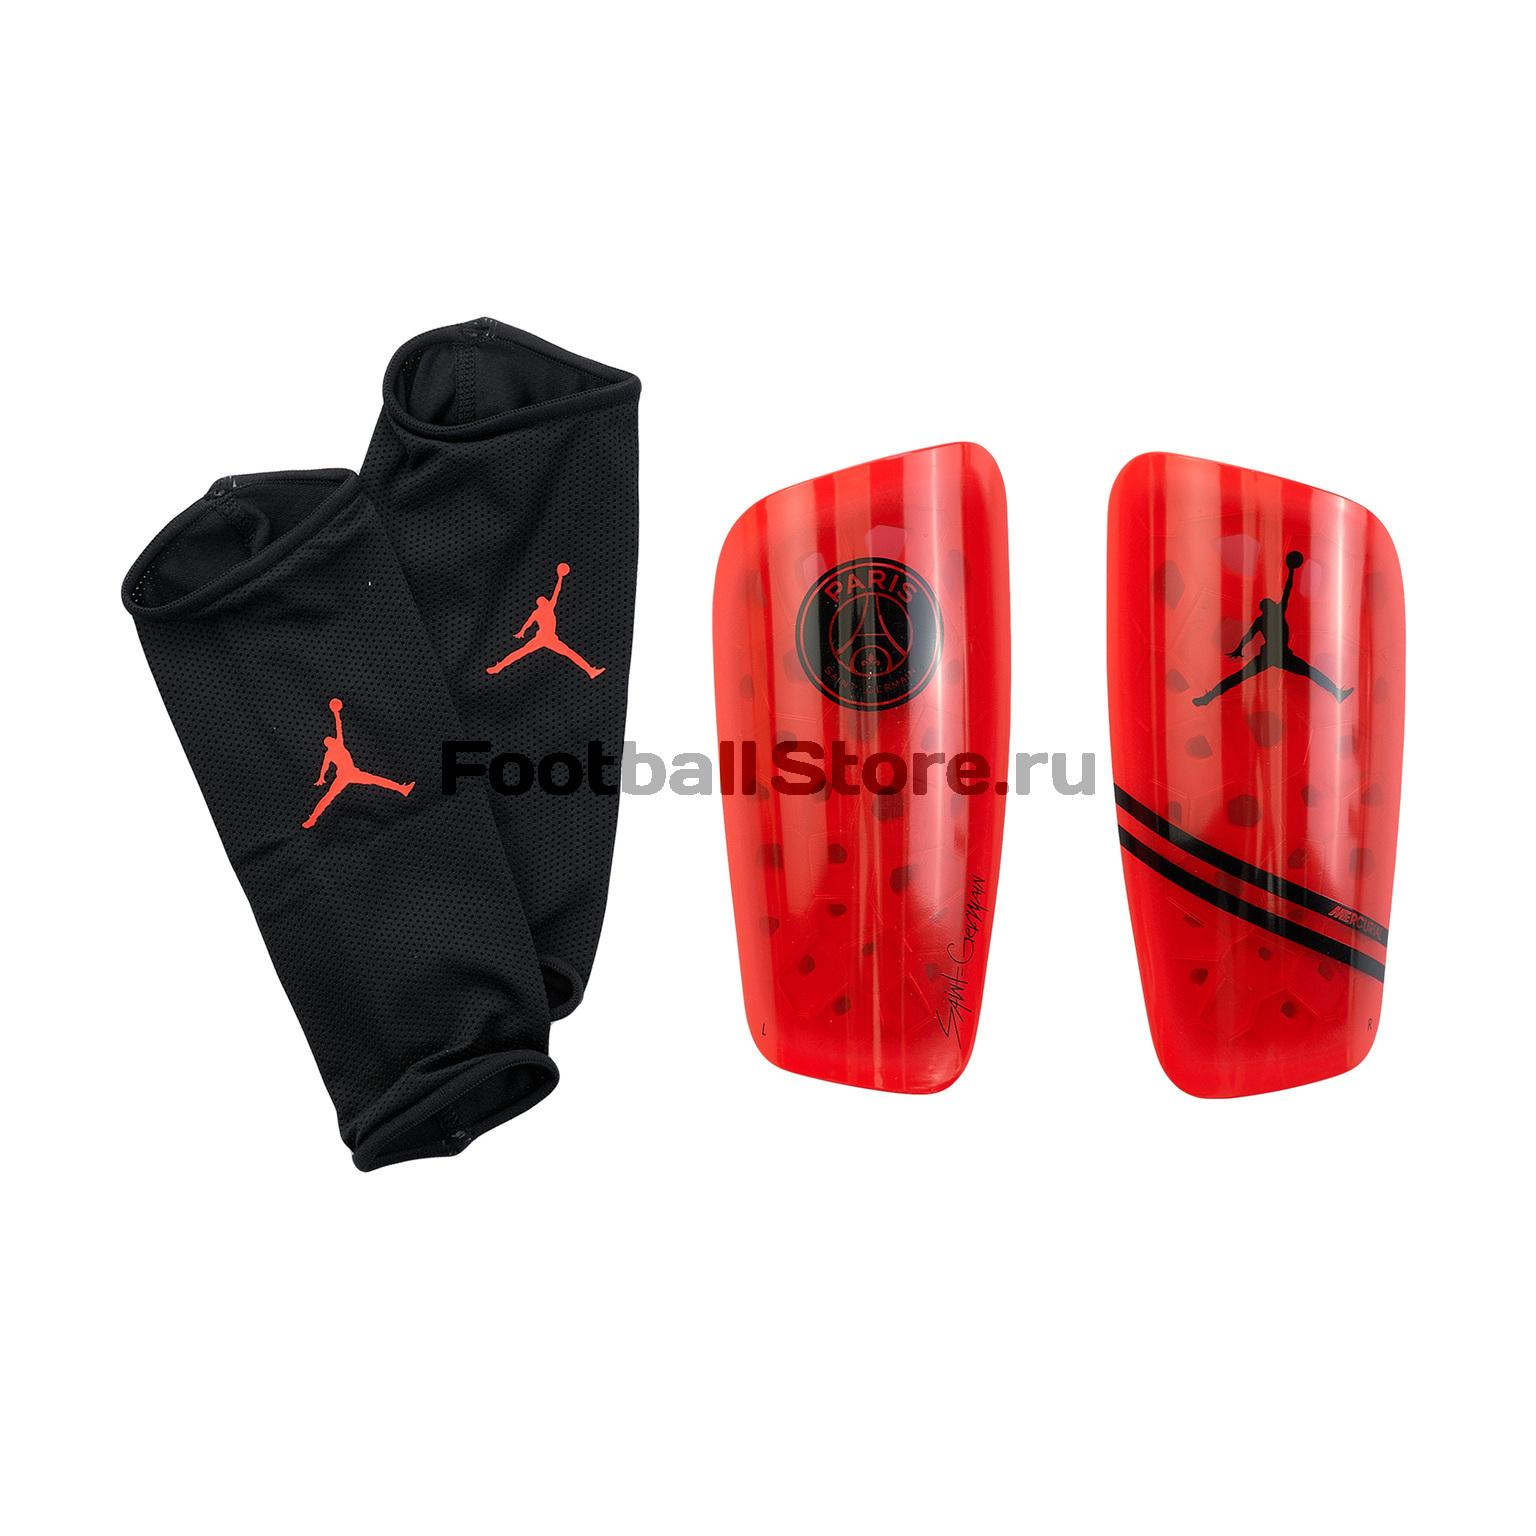 Щитки Nike PSG Mercurial Lite CQ6380-610